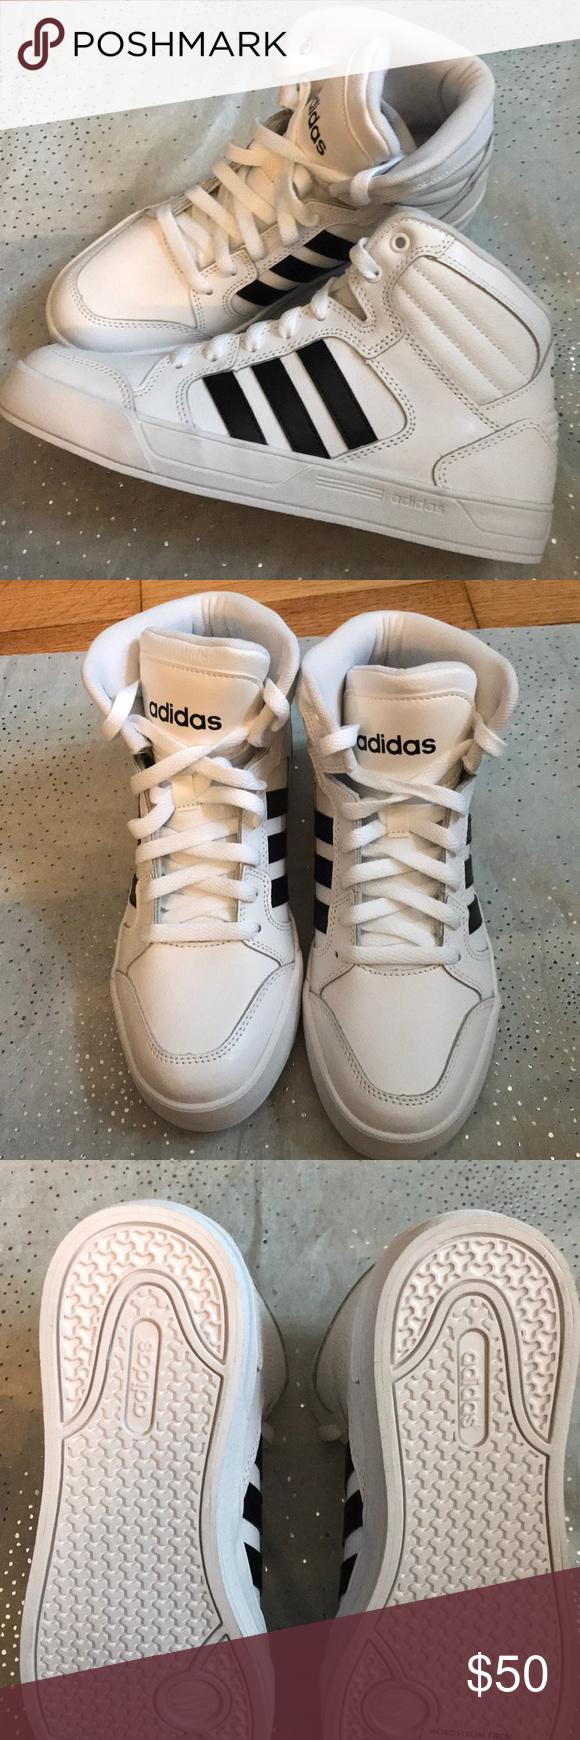 c19053741a34 Adidas Hightop White Navy Stripe - Stickers on! Hightop Adidas ...